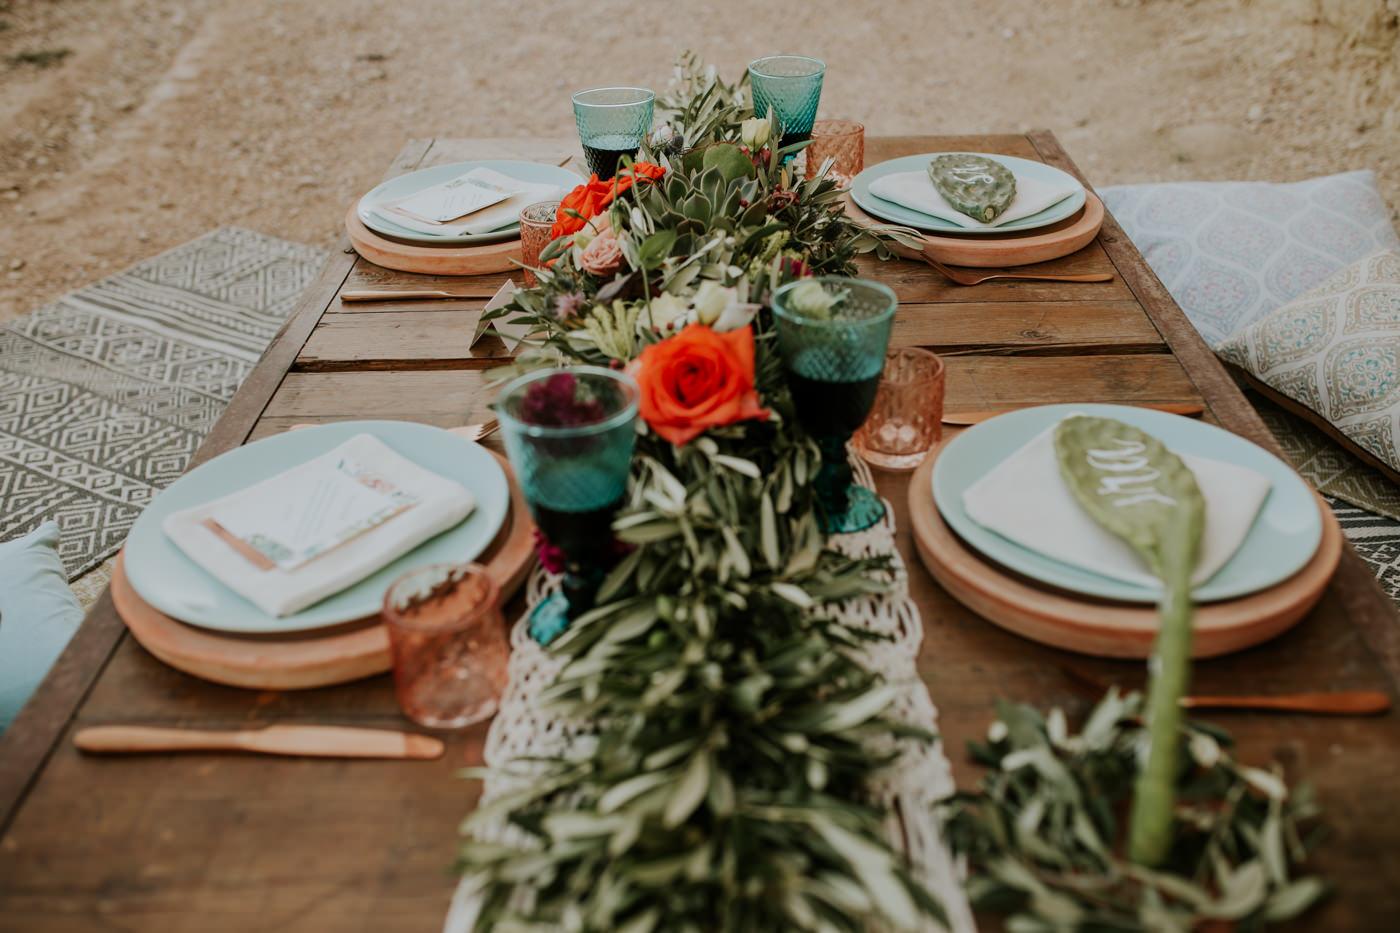 fotografo-boda-alicante-wedding-planner-aloha_estudio_mia_dreamer-0015